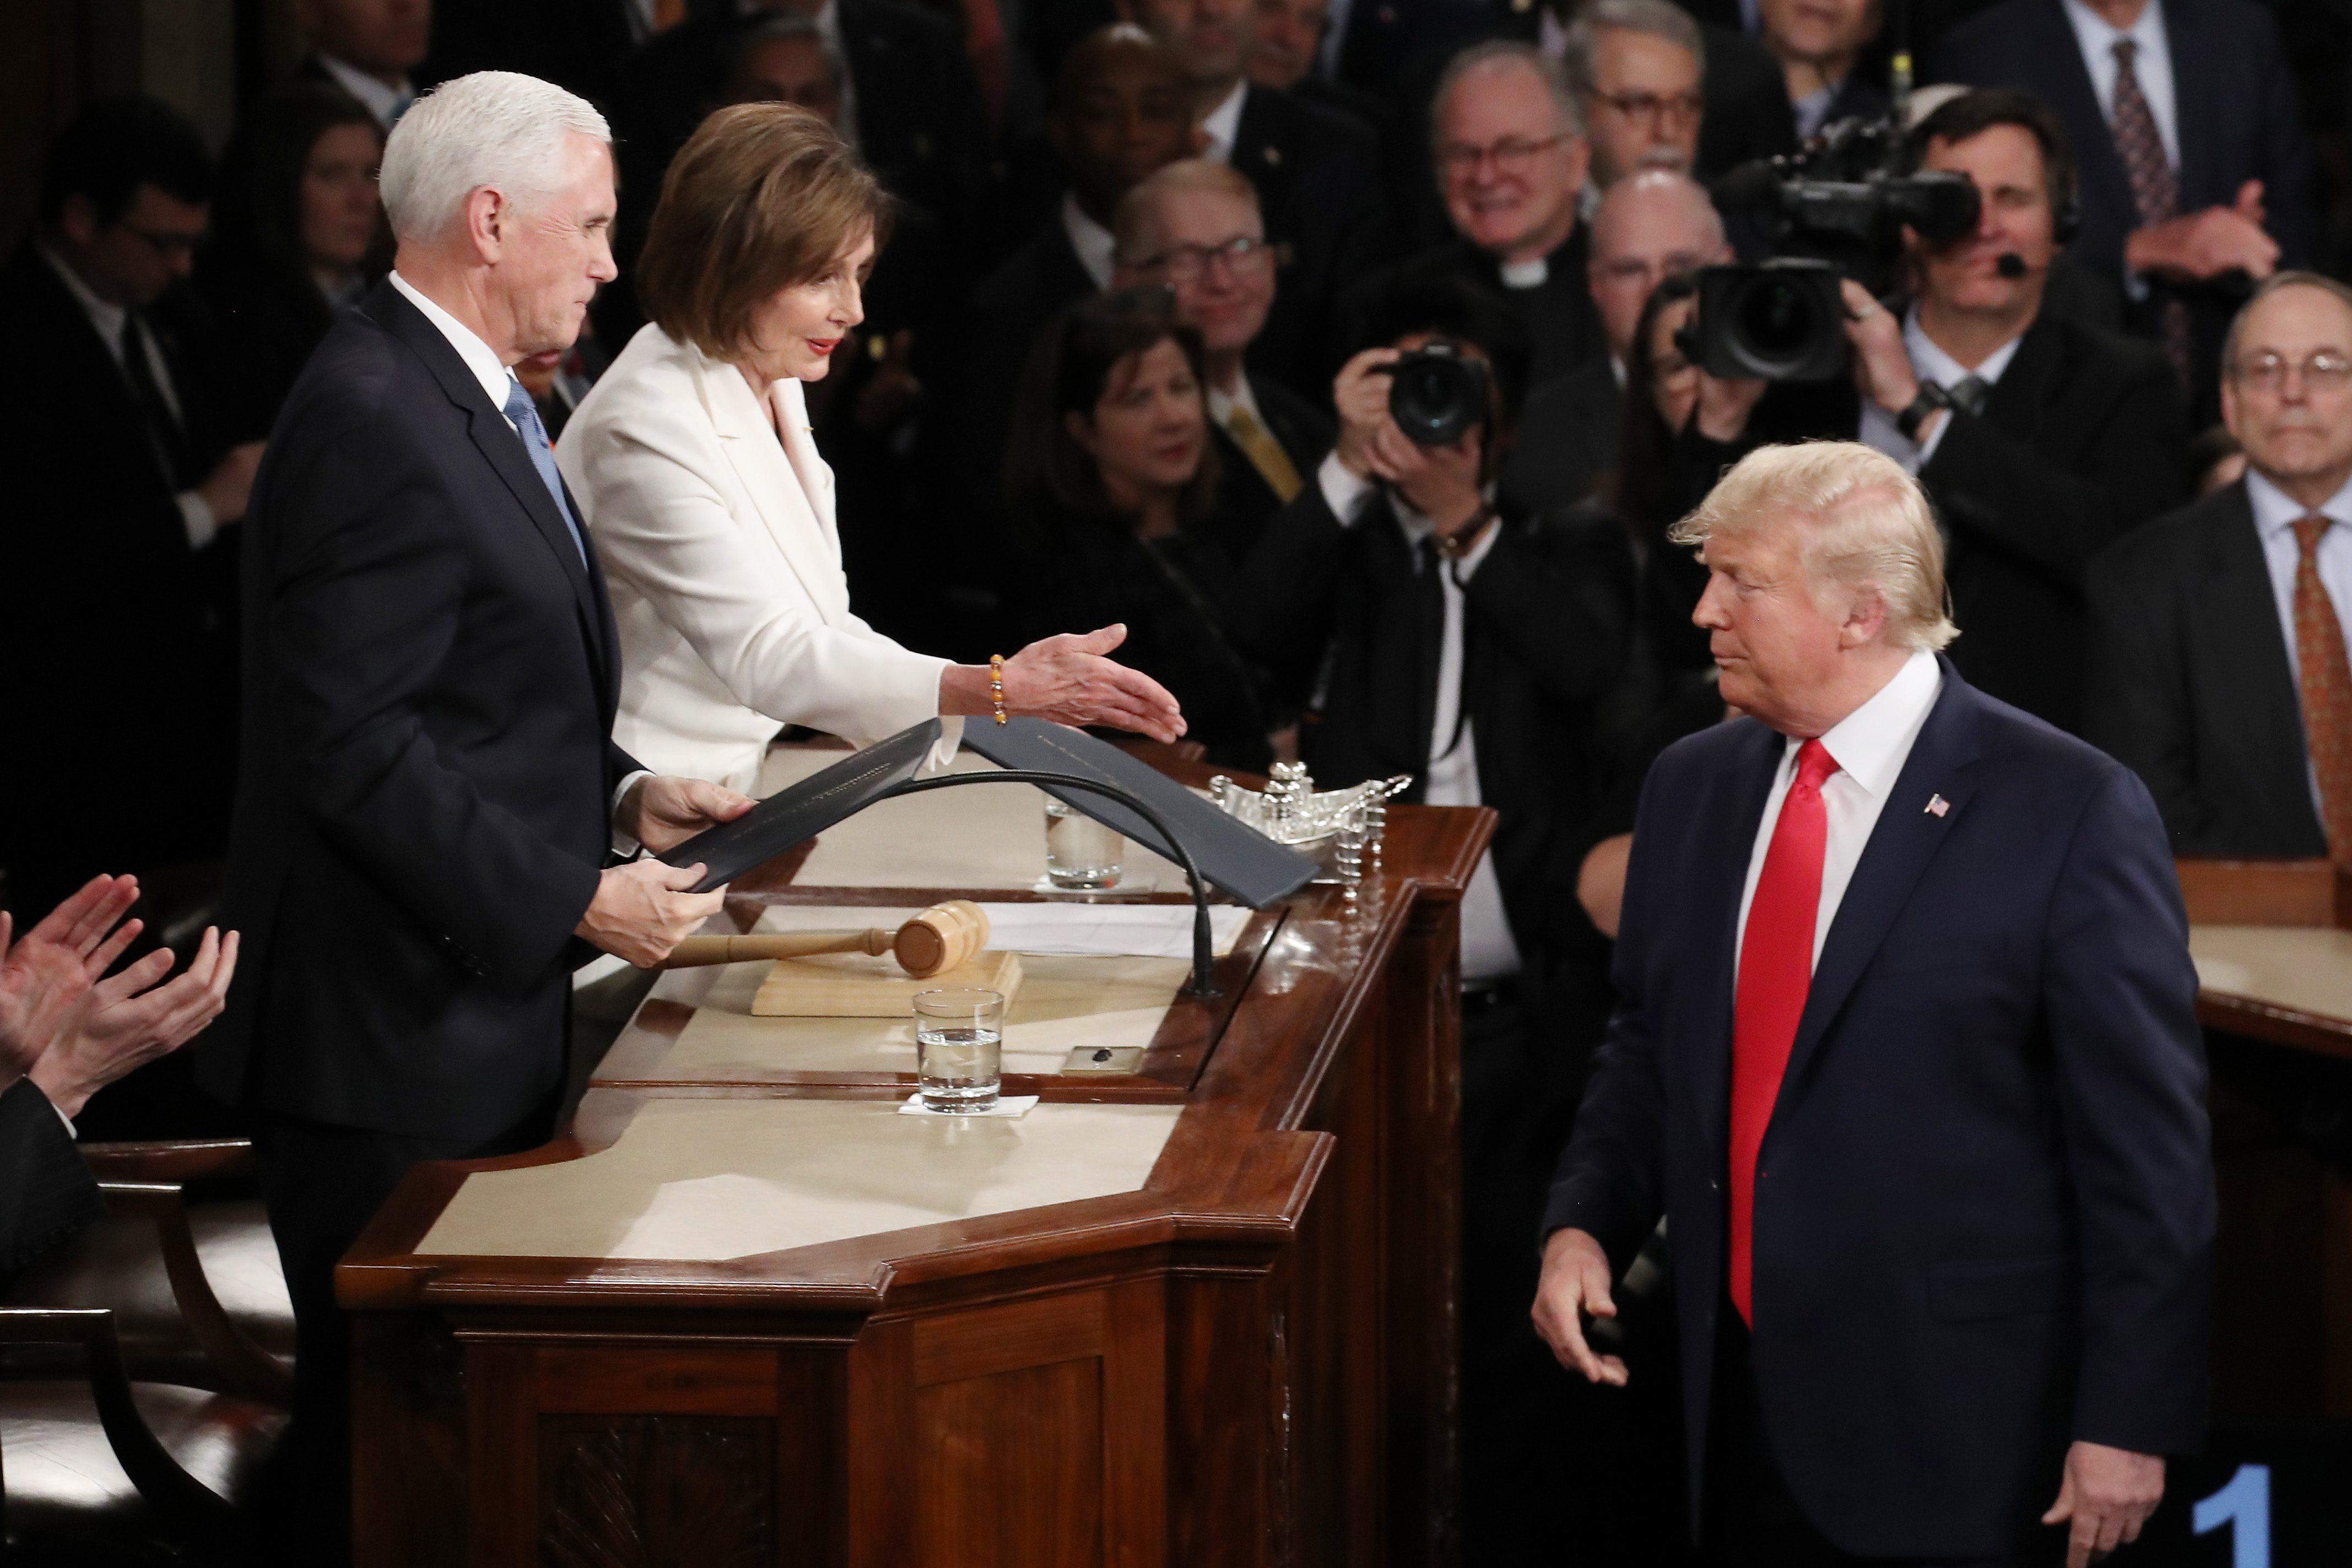 President Trump and Nancy Pelosi